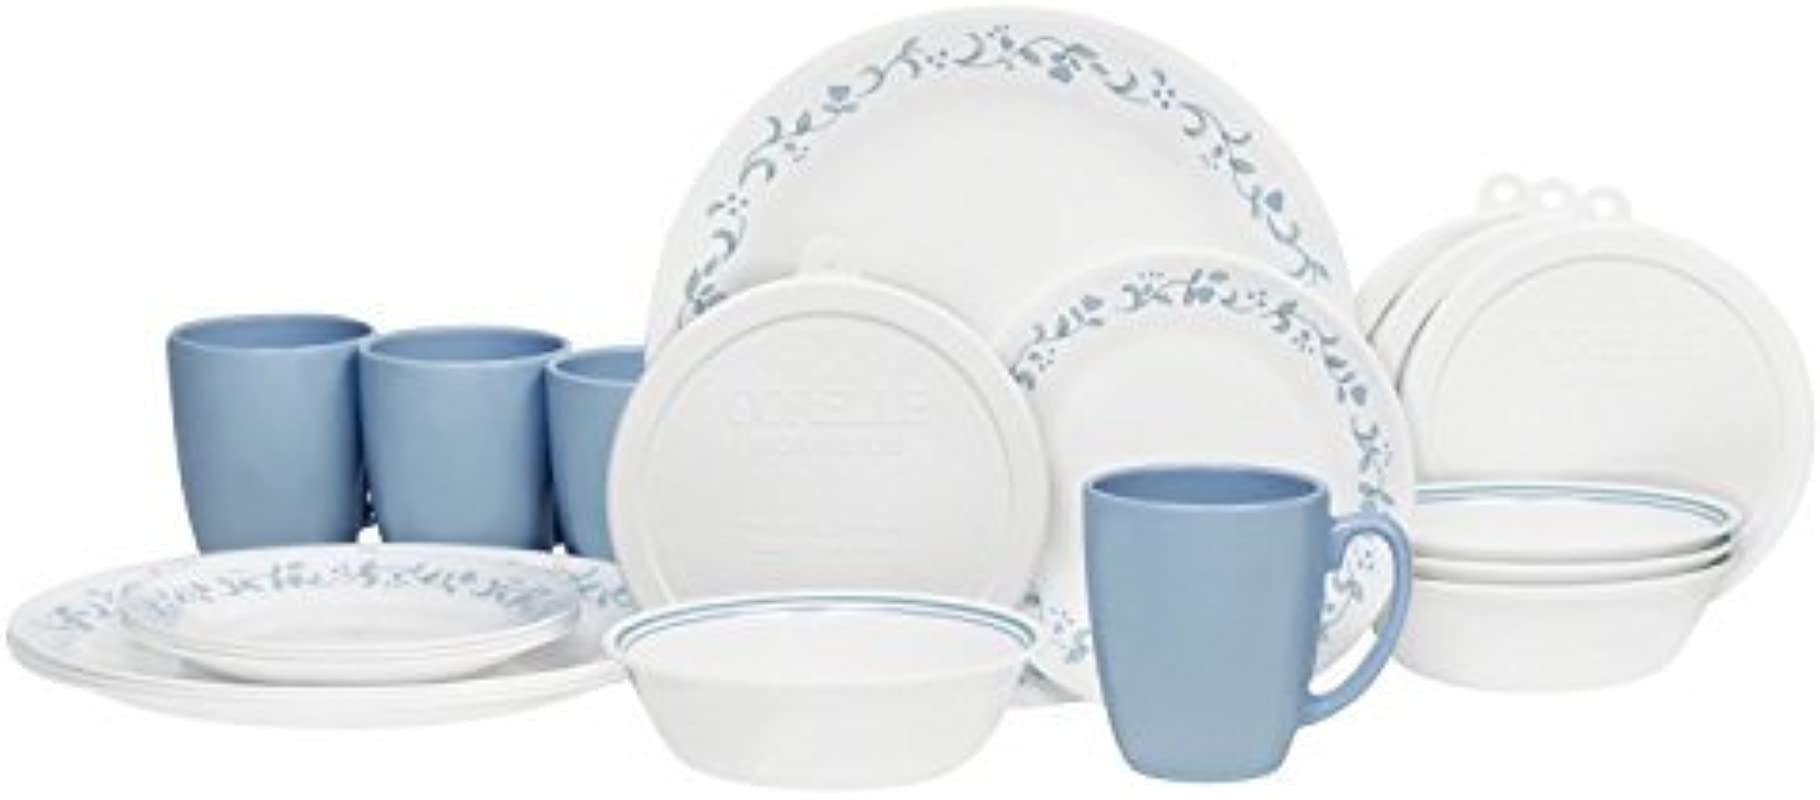 Corelle Livingware 32 Piece Country Cottage Dinnerware Set Service For 8 By Corelle Coordinates